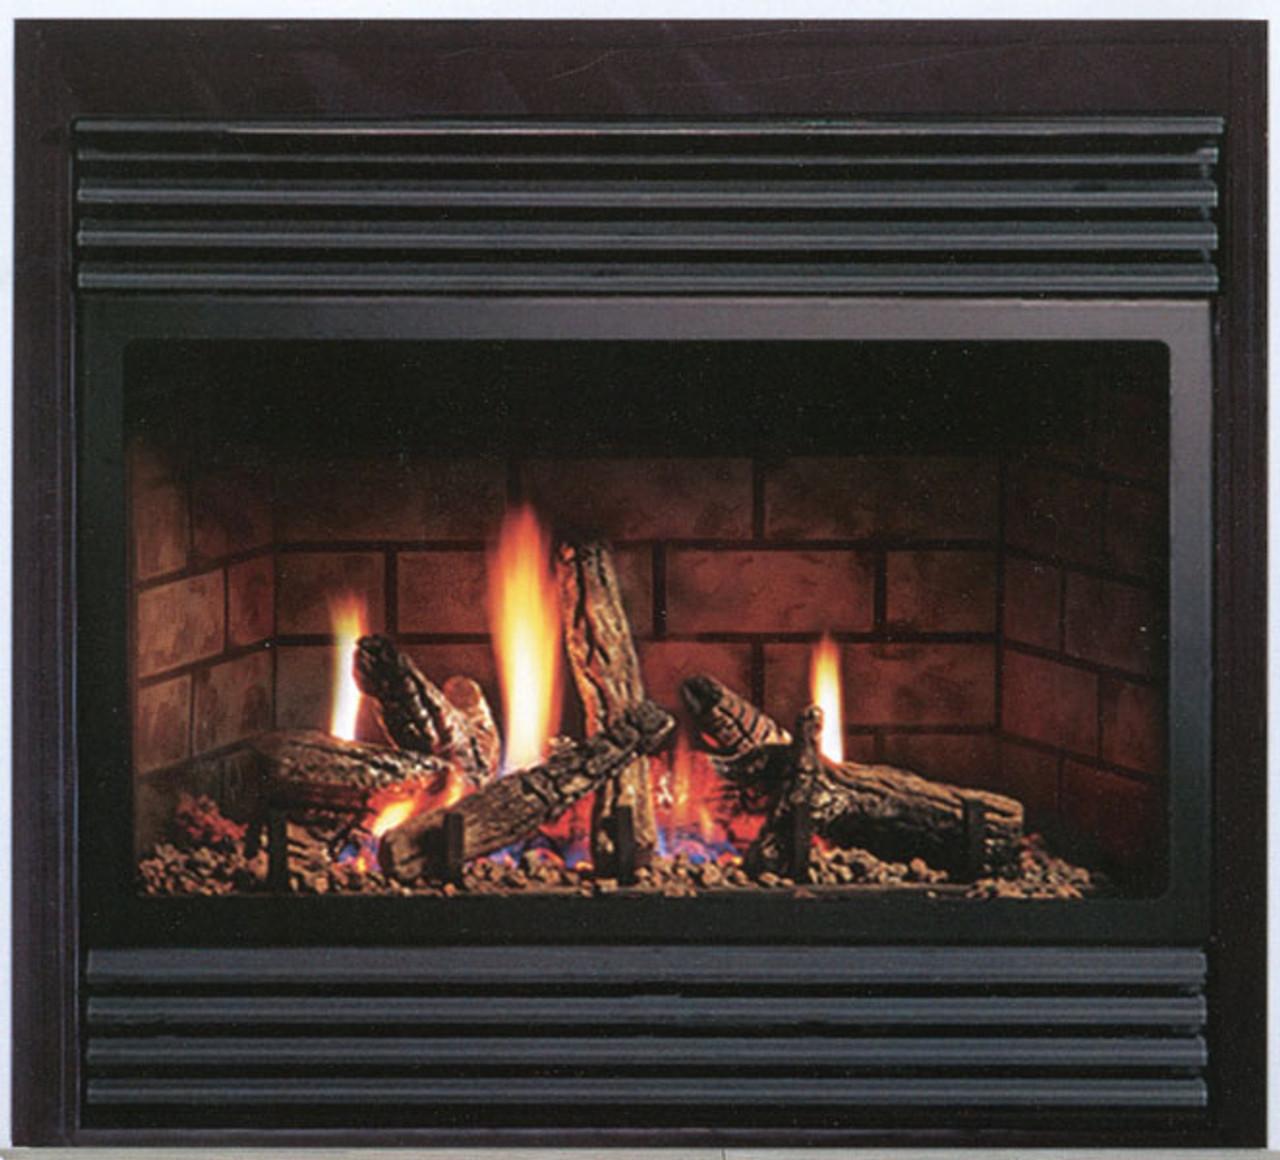 Kingsman Zdv3318 Zero Clearance Direct Vent Gas Fireplace Heater Fireplacesrus